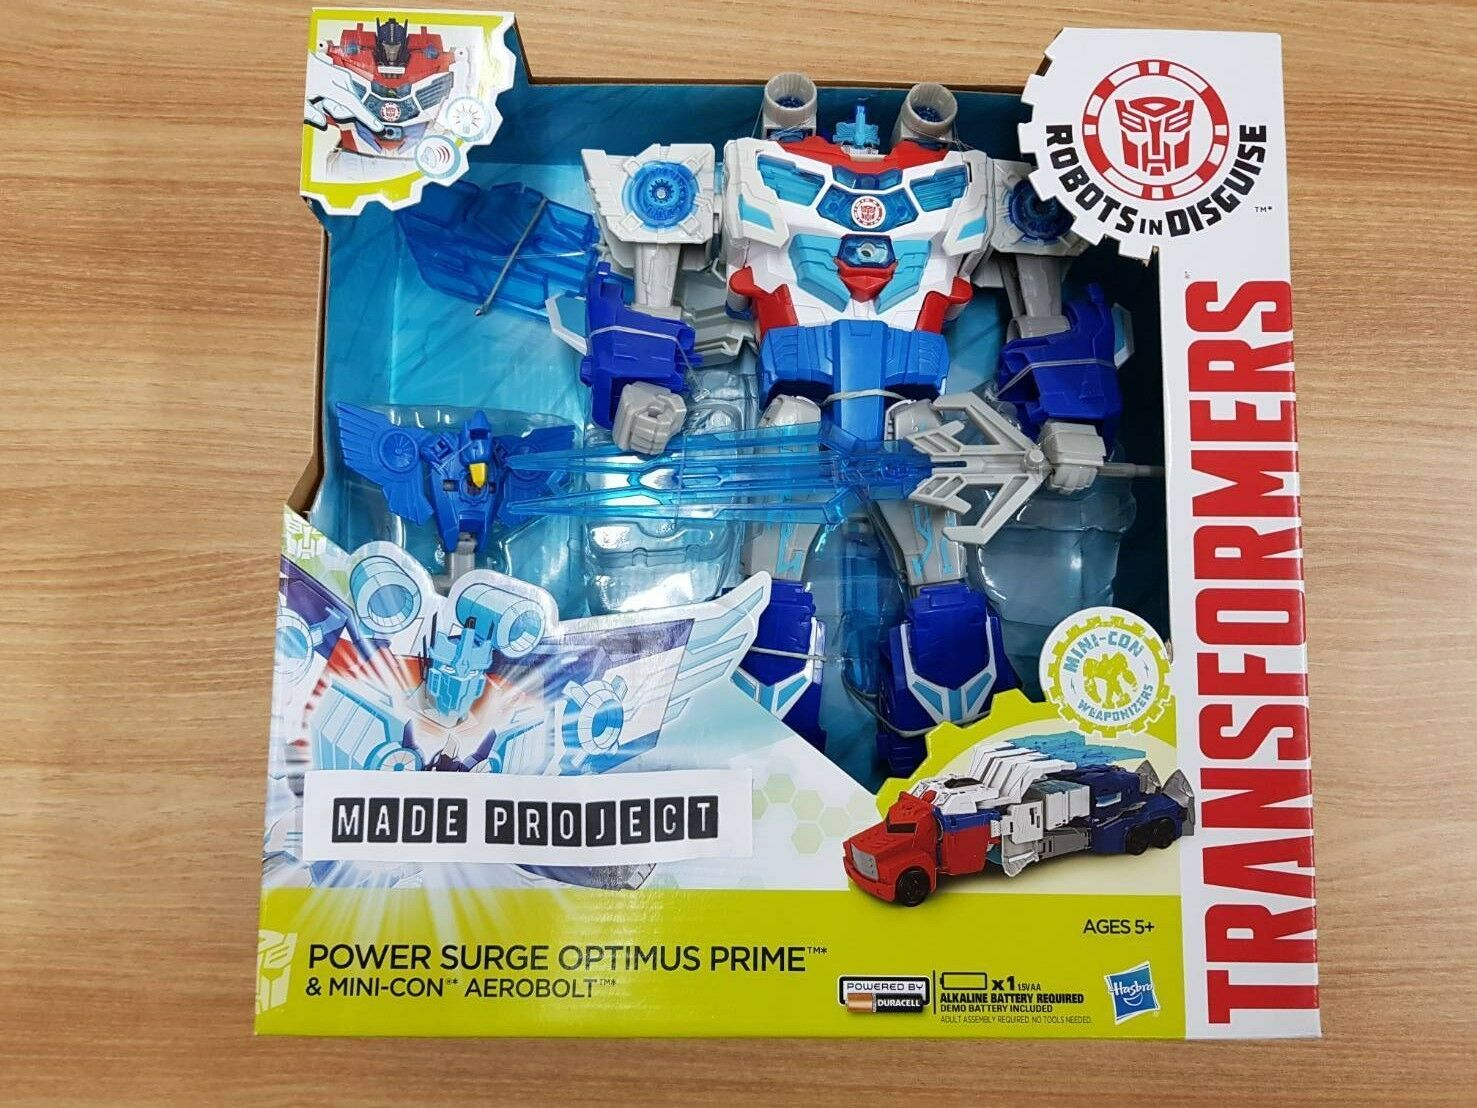 Hasbro Transformers Robots in Disguise Power Surge Optimus Prime&Aerobolt New